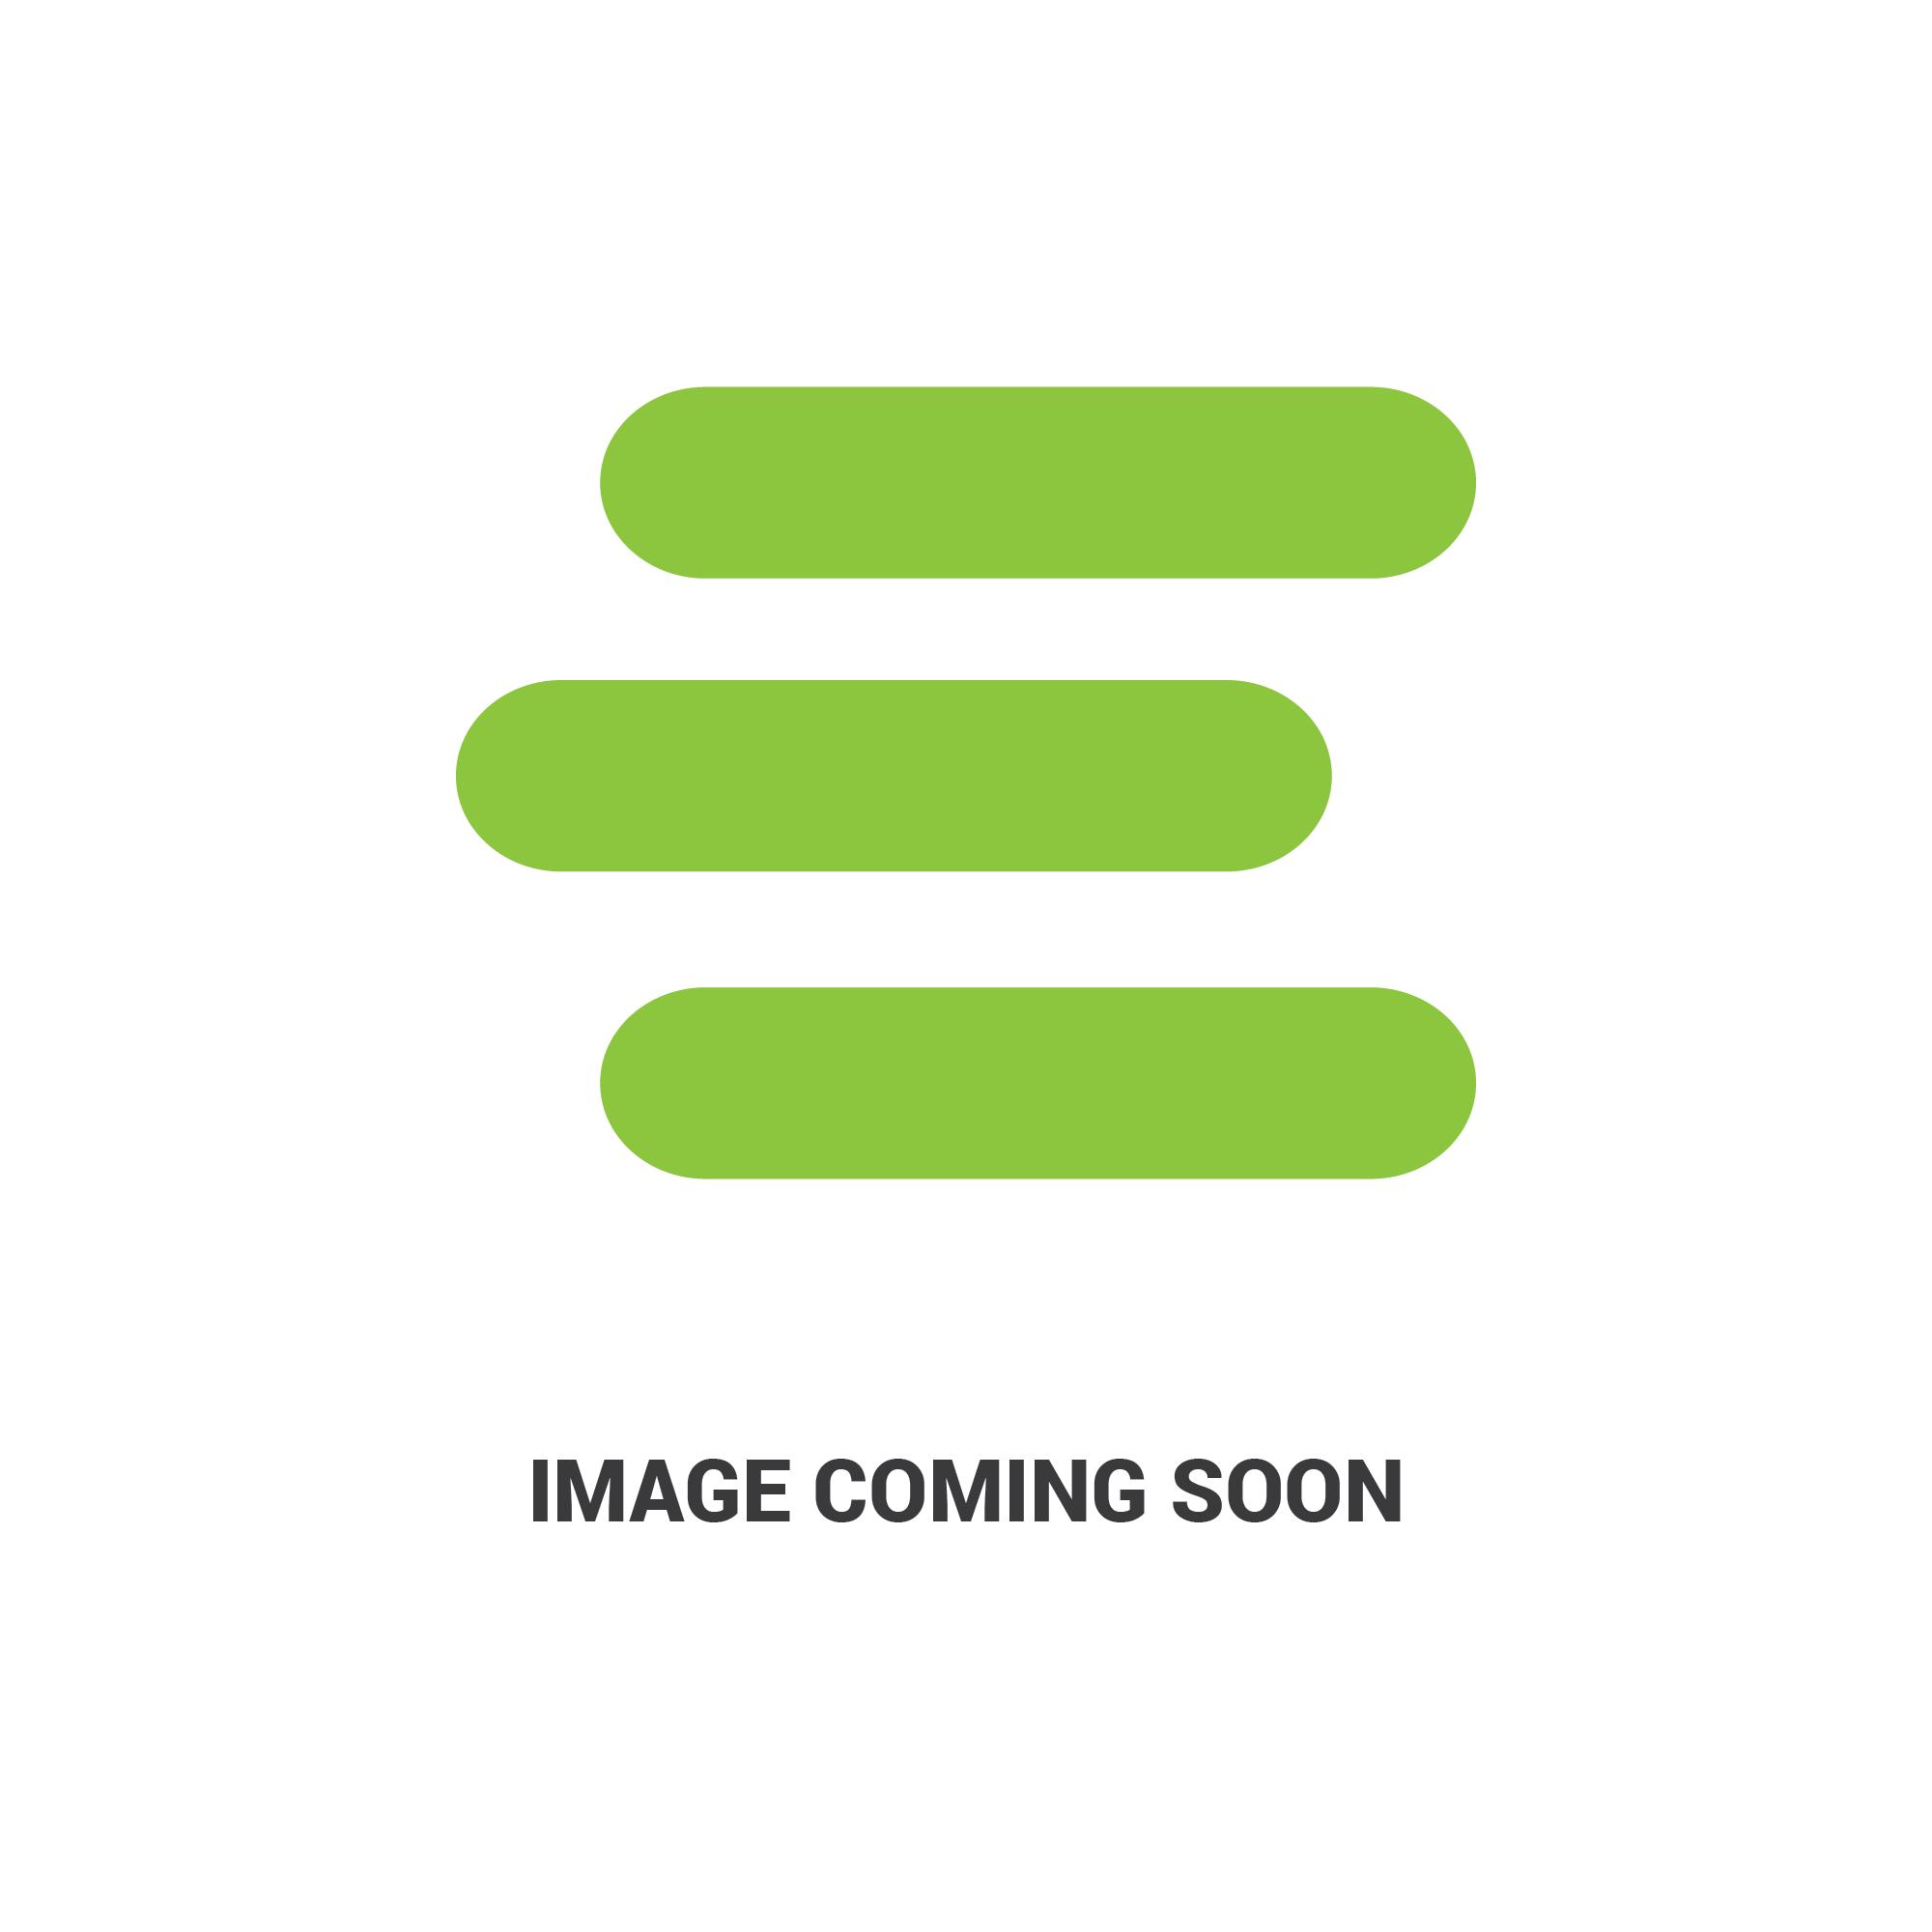 E-1882323edit 1.jpg